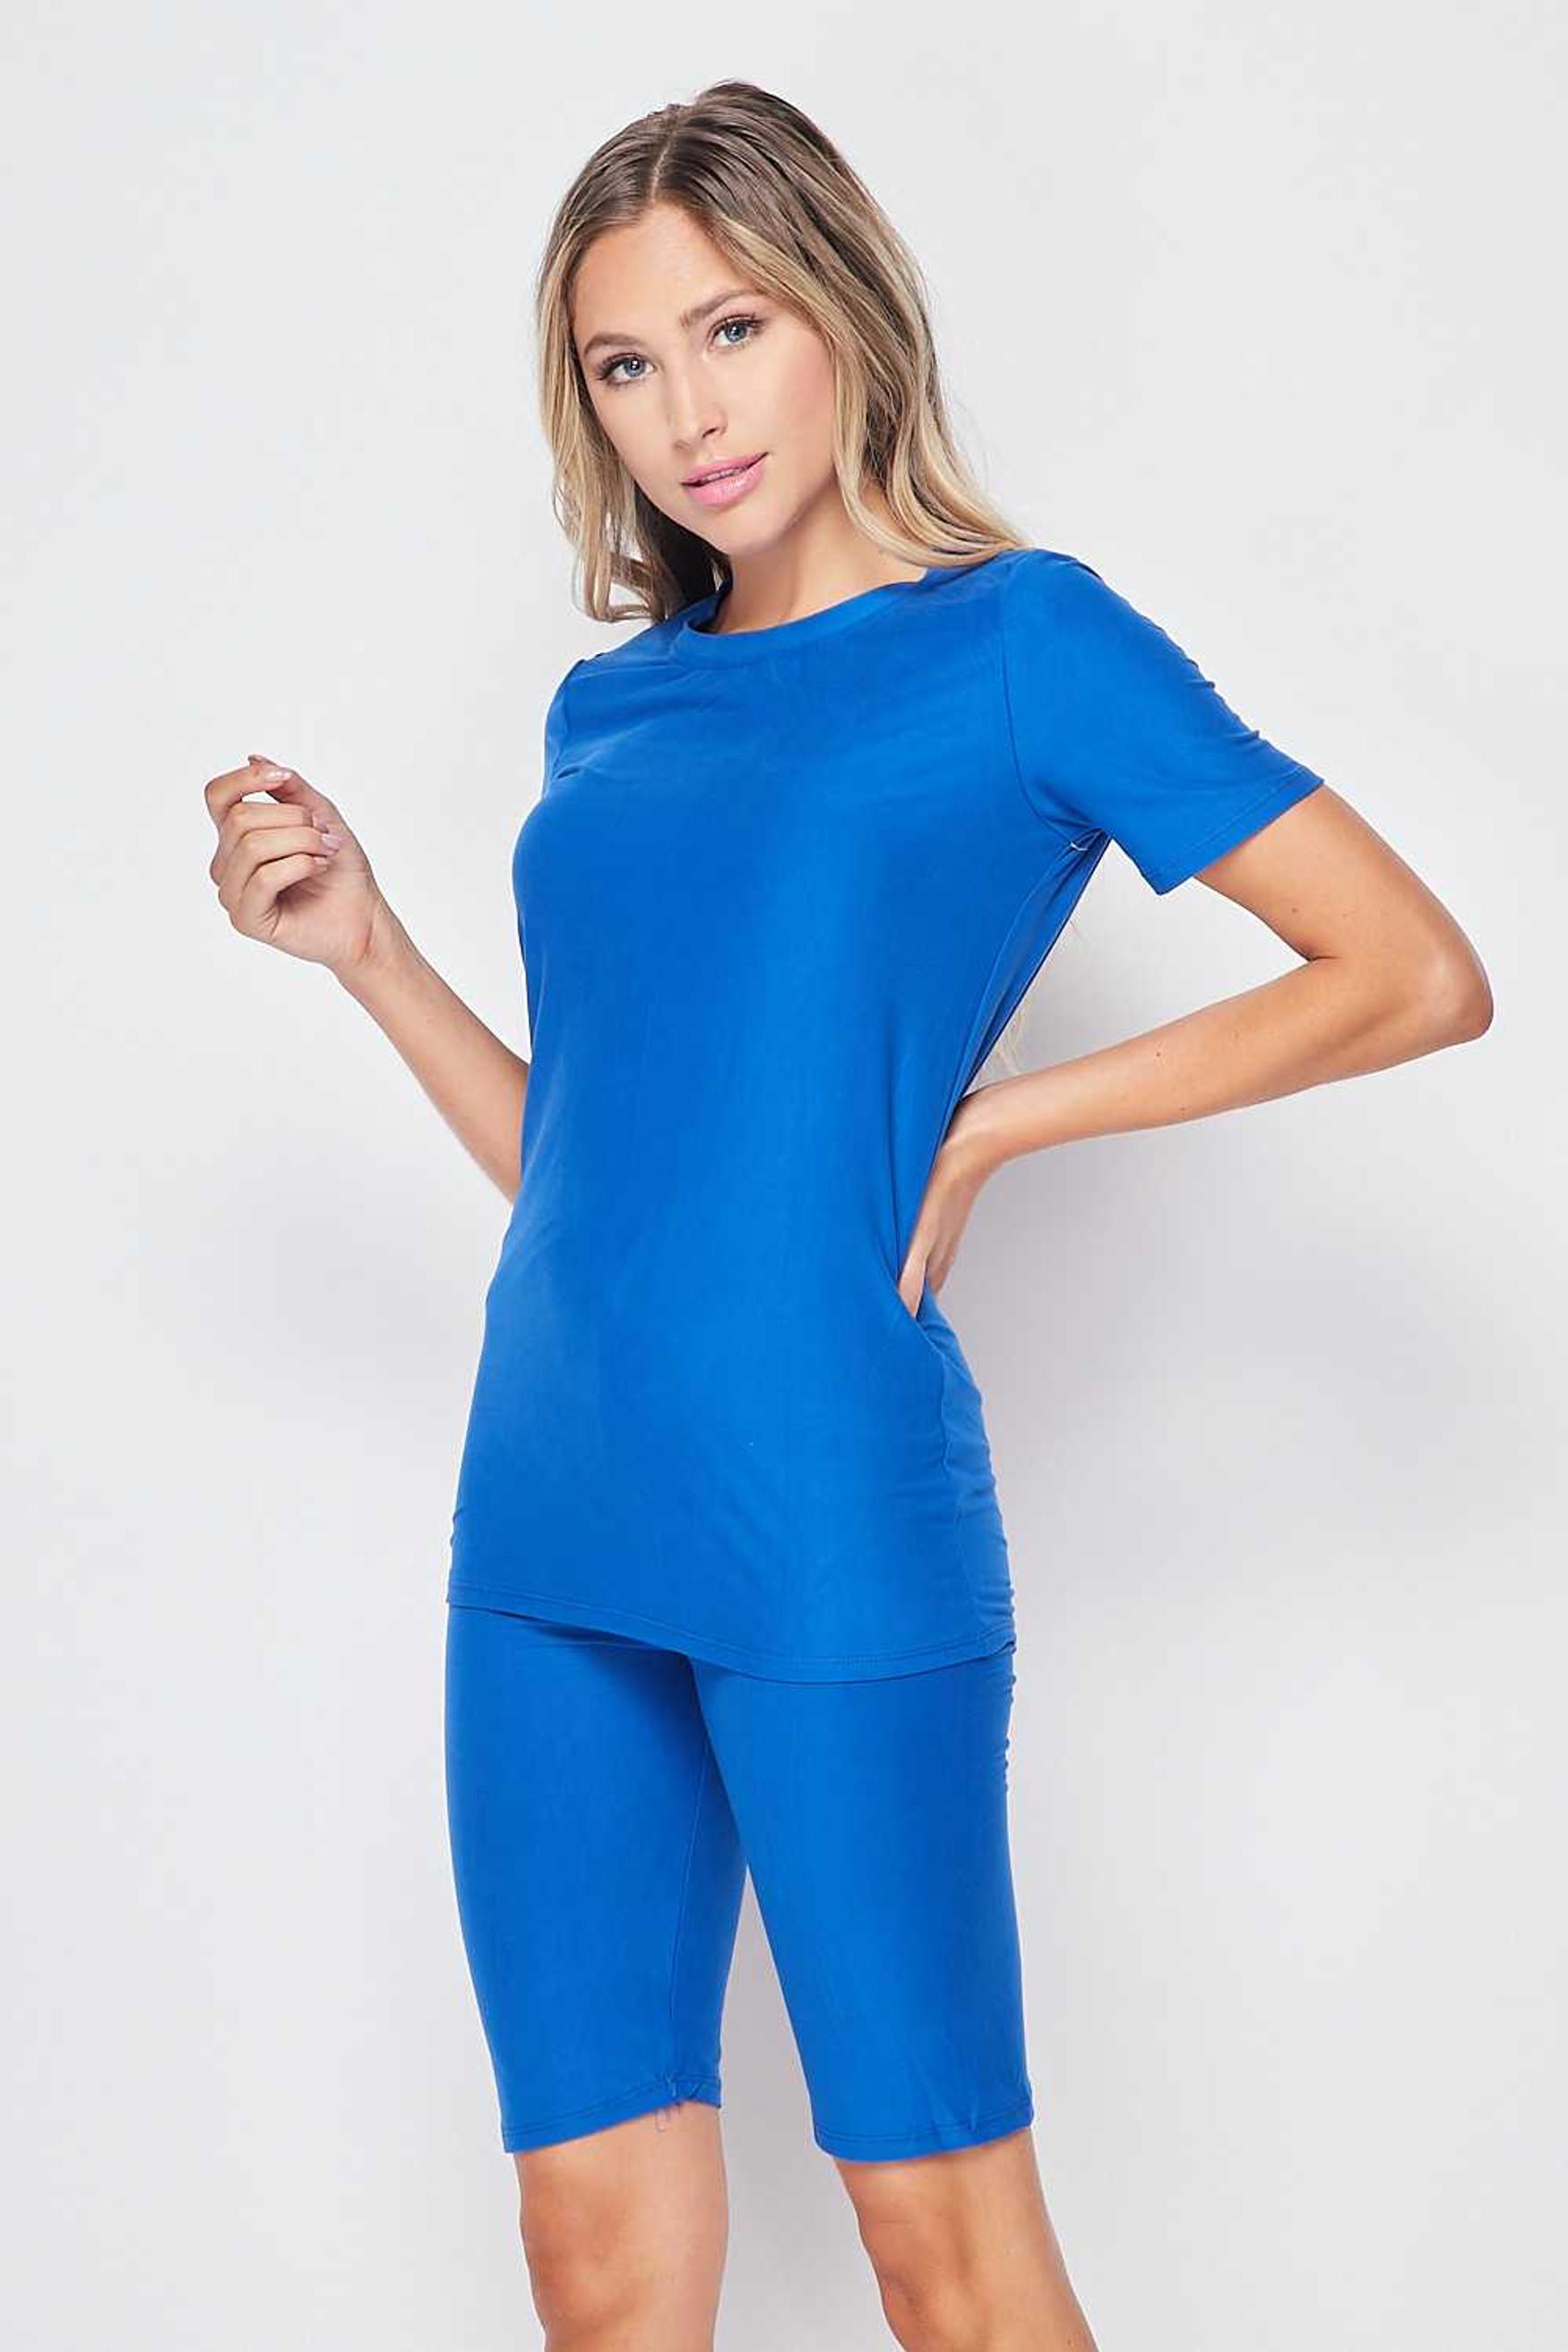 Left side of Royal Blue Buttery Soft Basic Solid Biker Shorts and T-Shirt Set